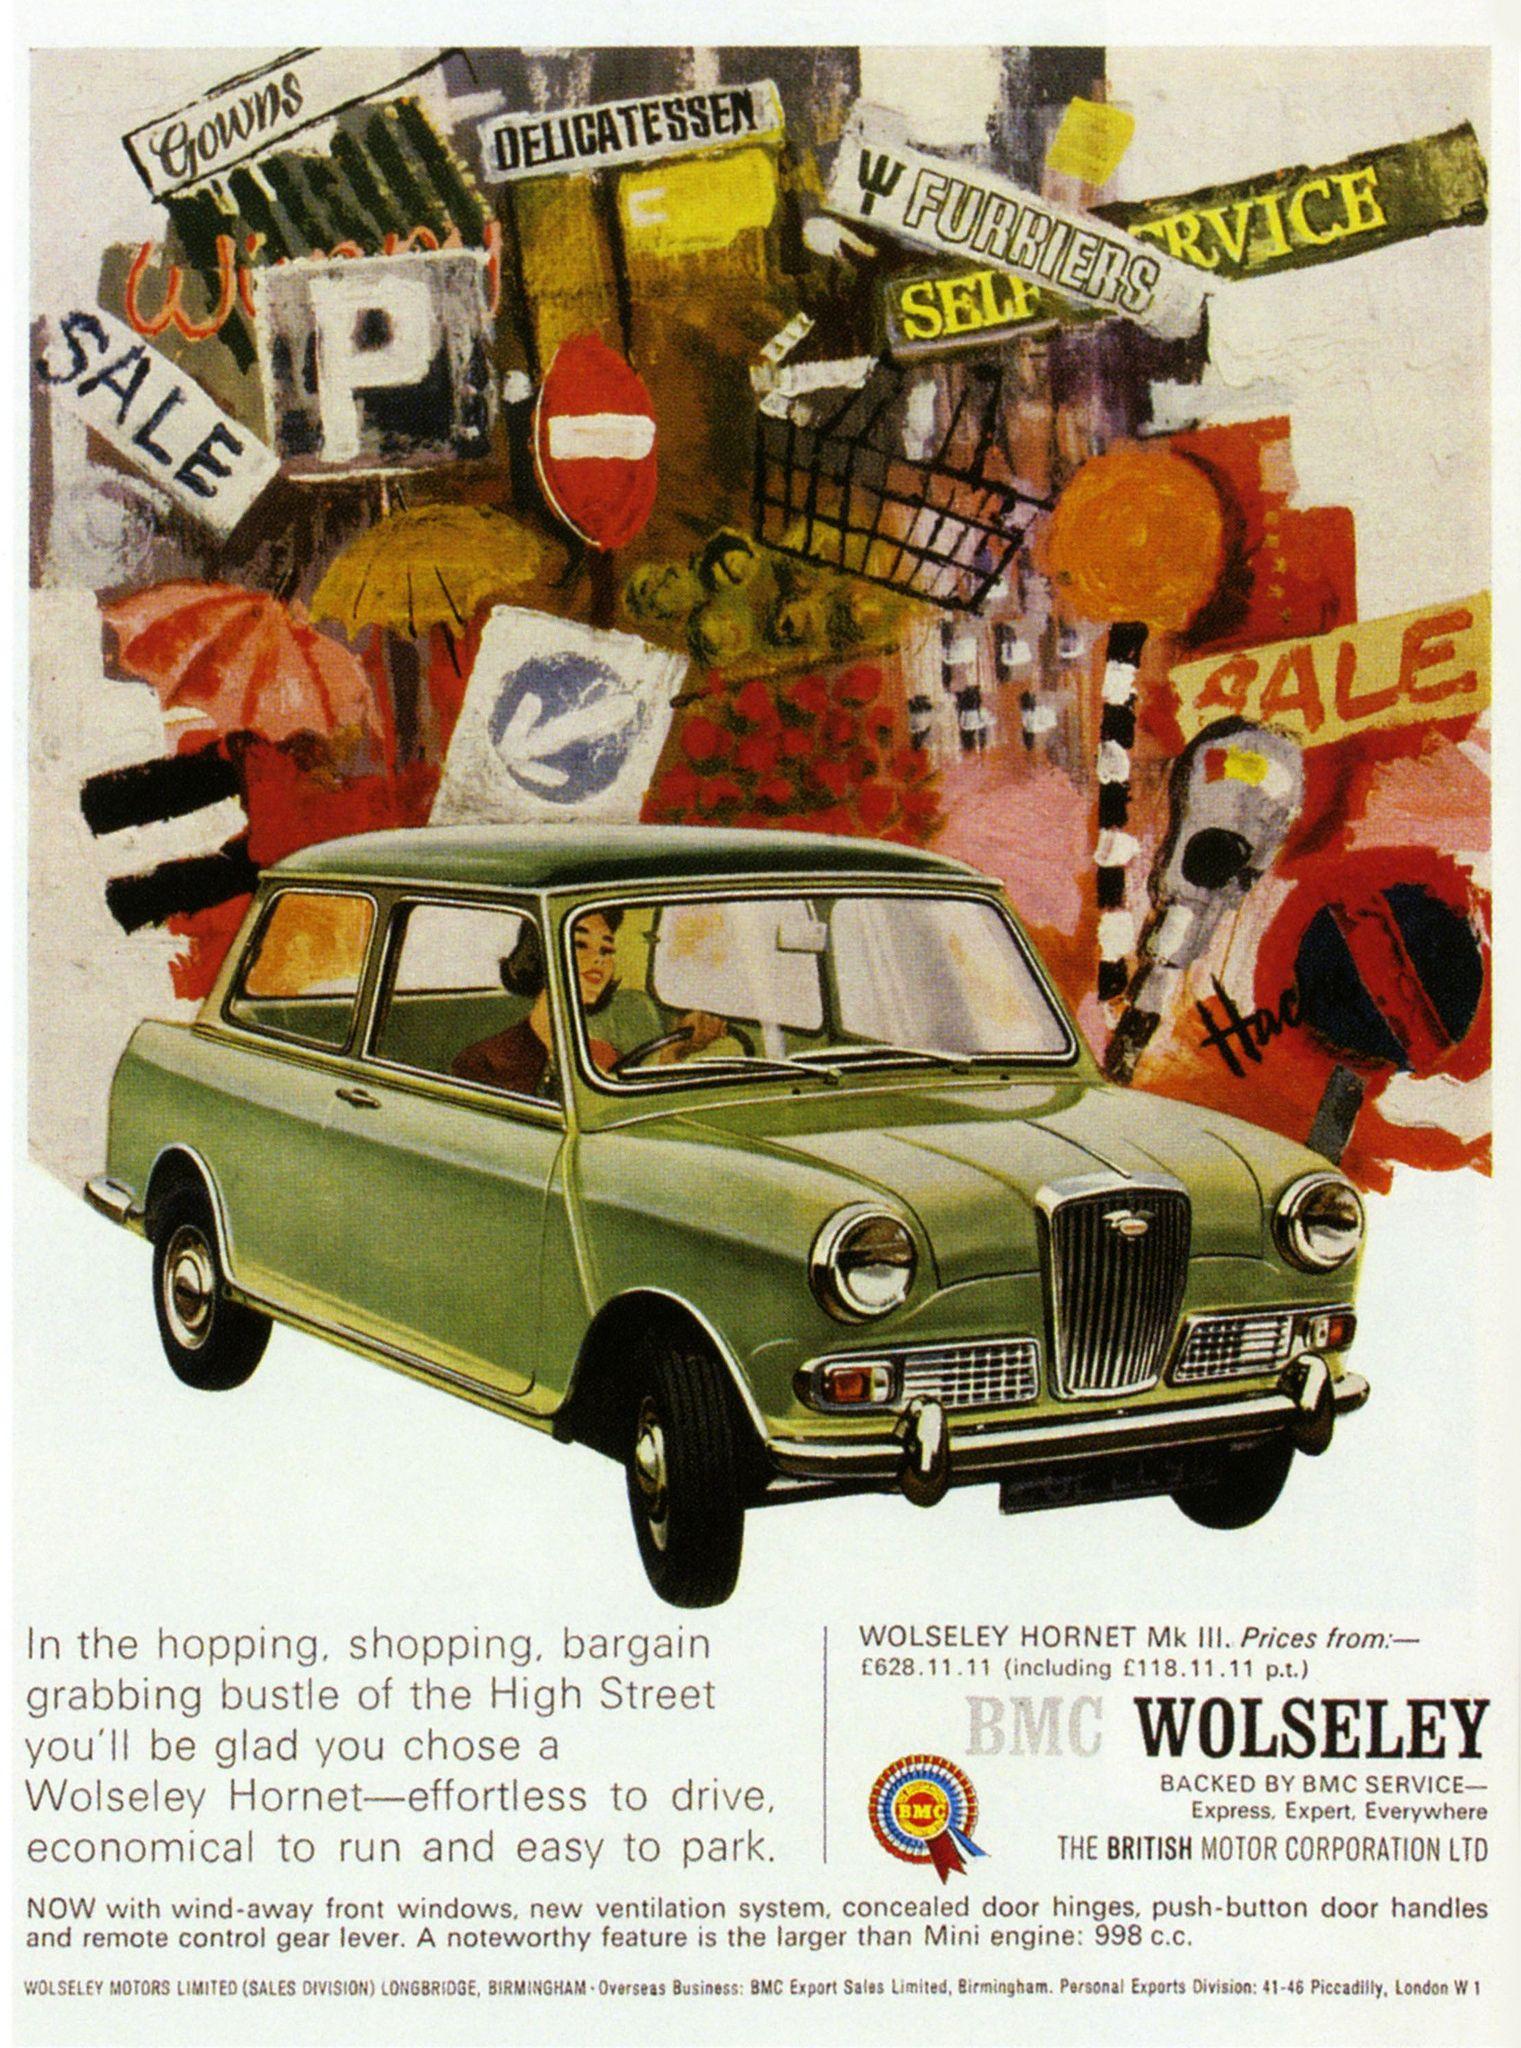 bmc wolseley hornet mark iii 1967 - 46 Automotive Cv Effortless